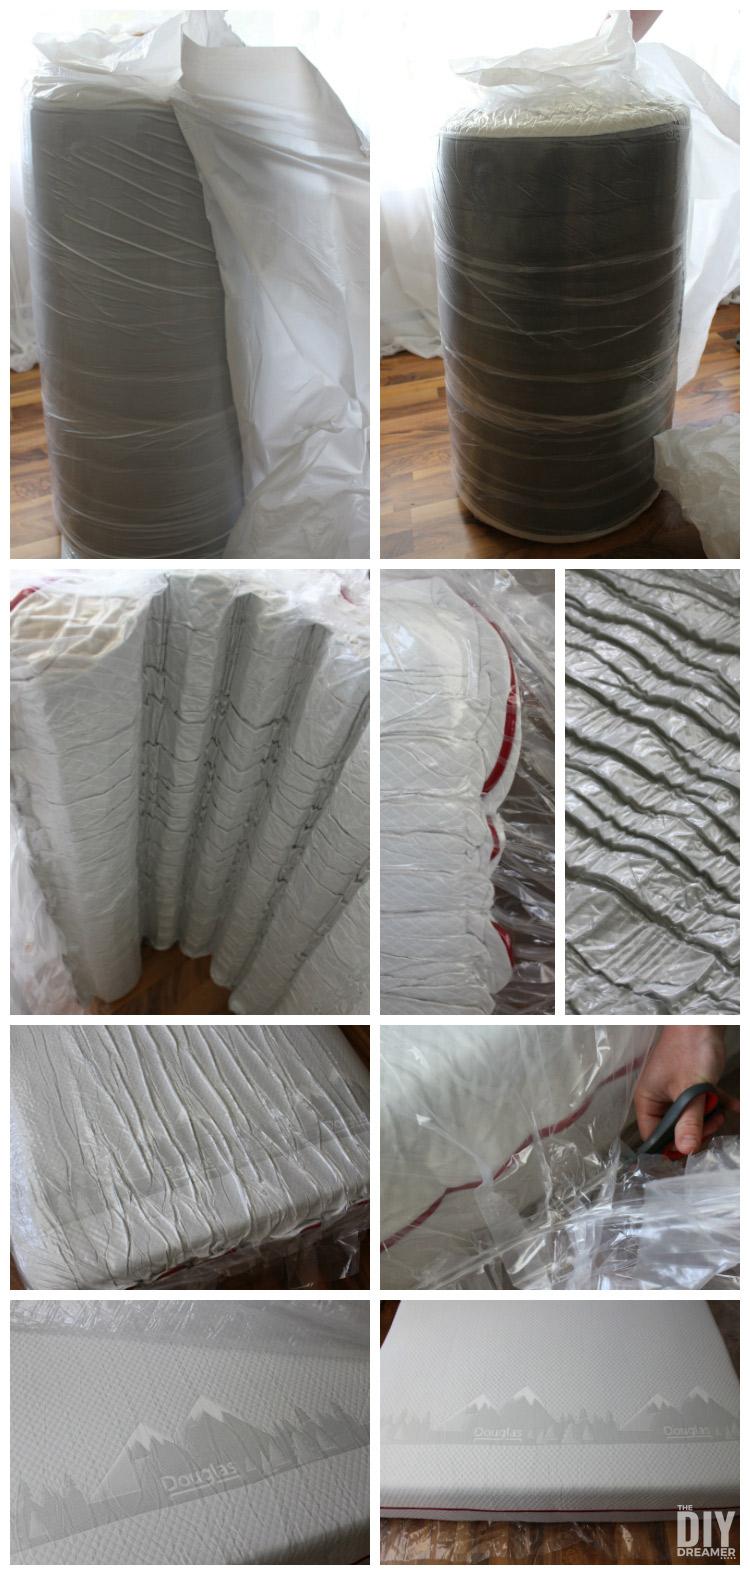 How to unwrap a mattress in a box